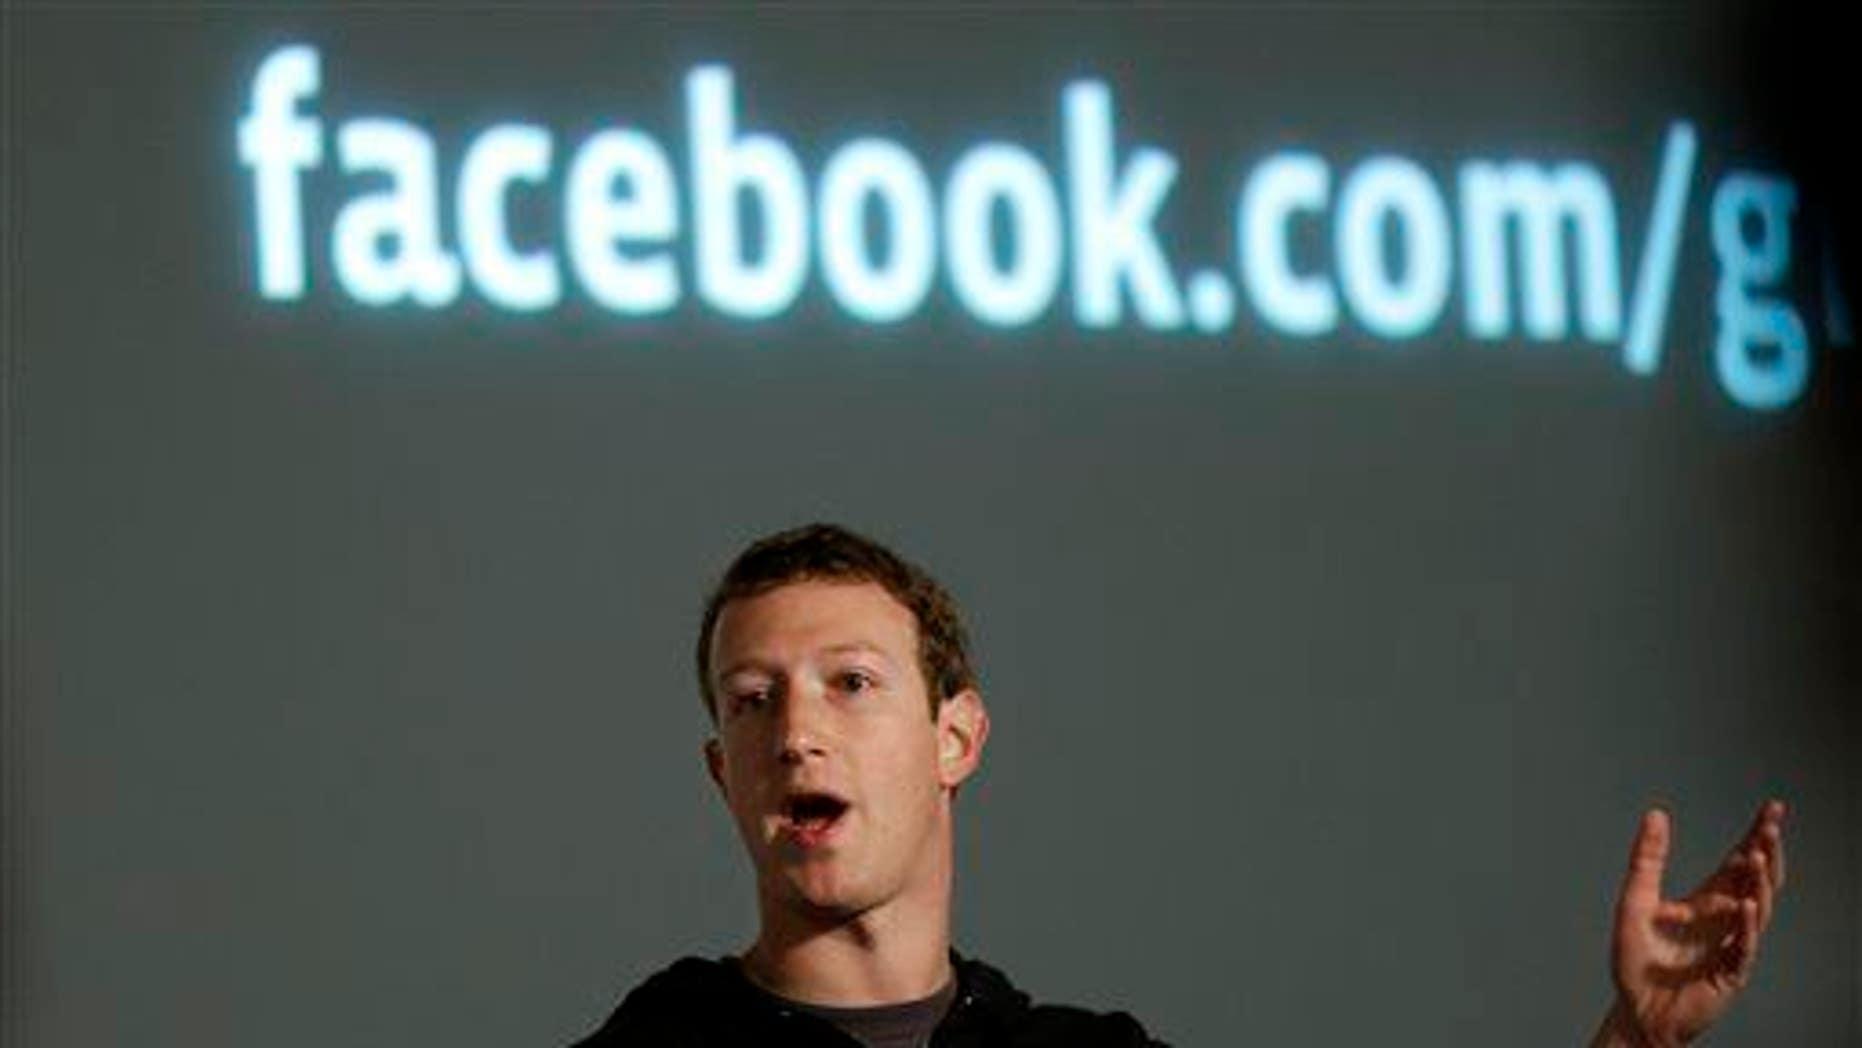 Facebook CEO Mark Zuckerberg speaks at Facebook headquarters.